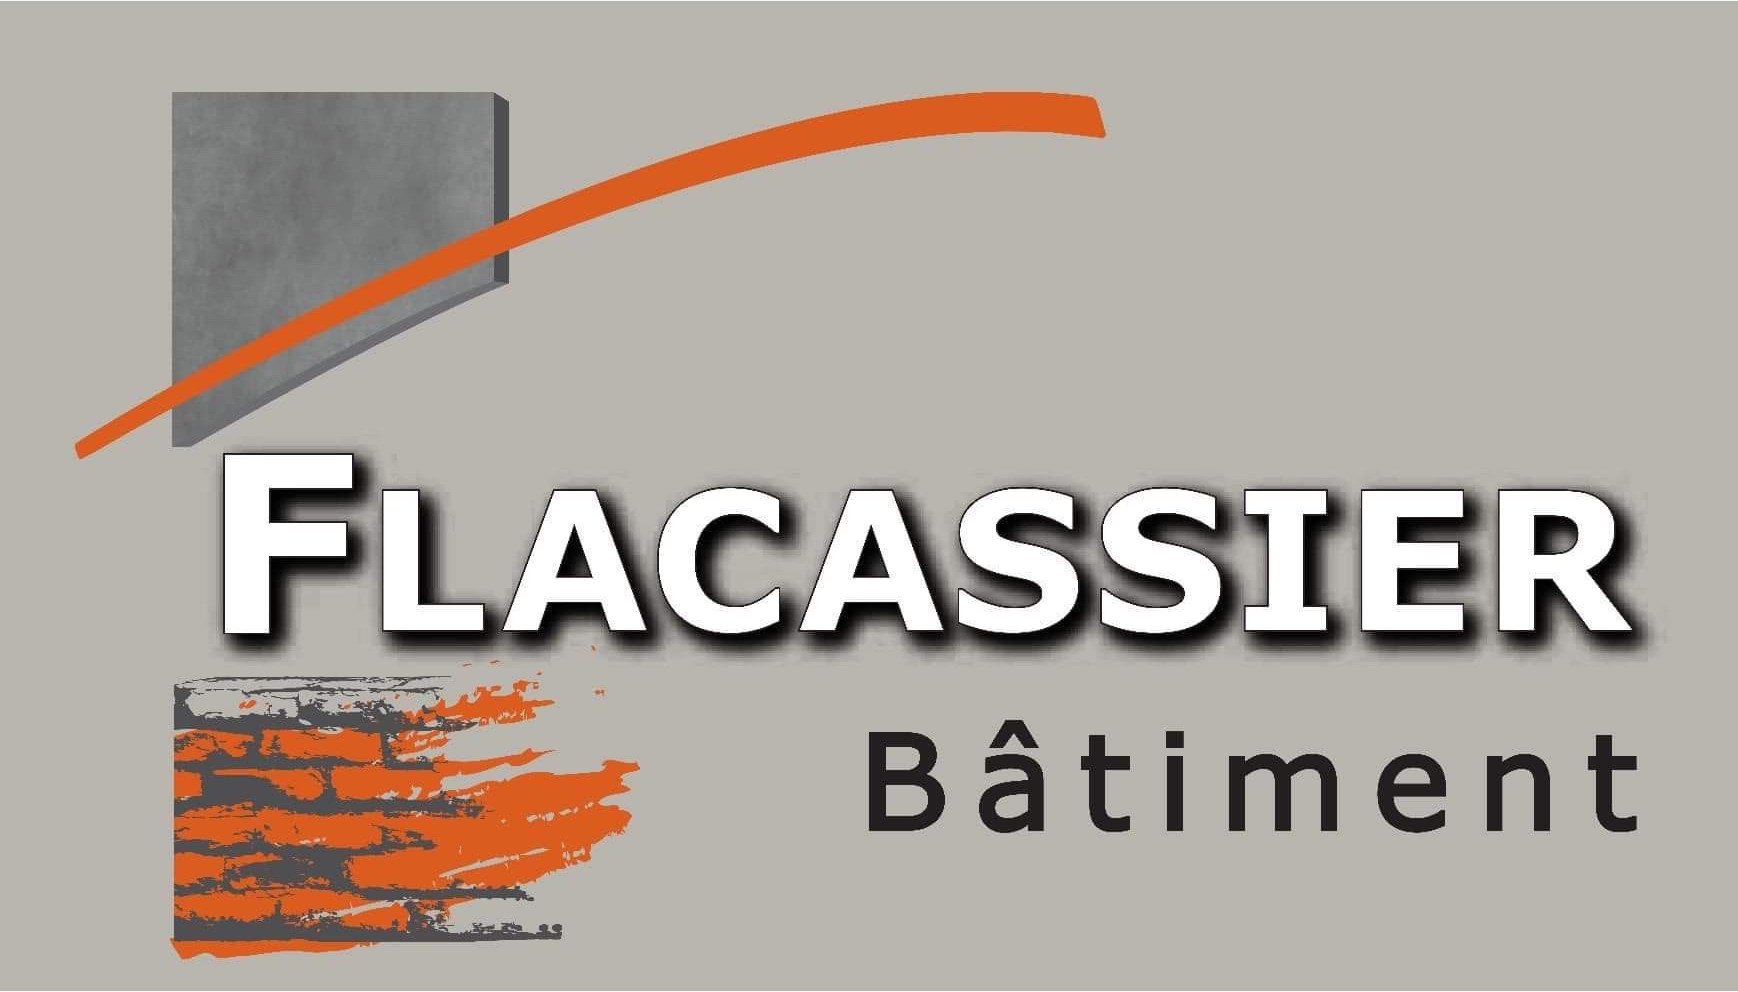 Flacassier Batiment